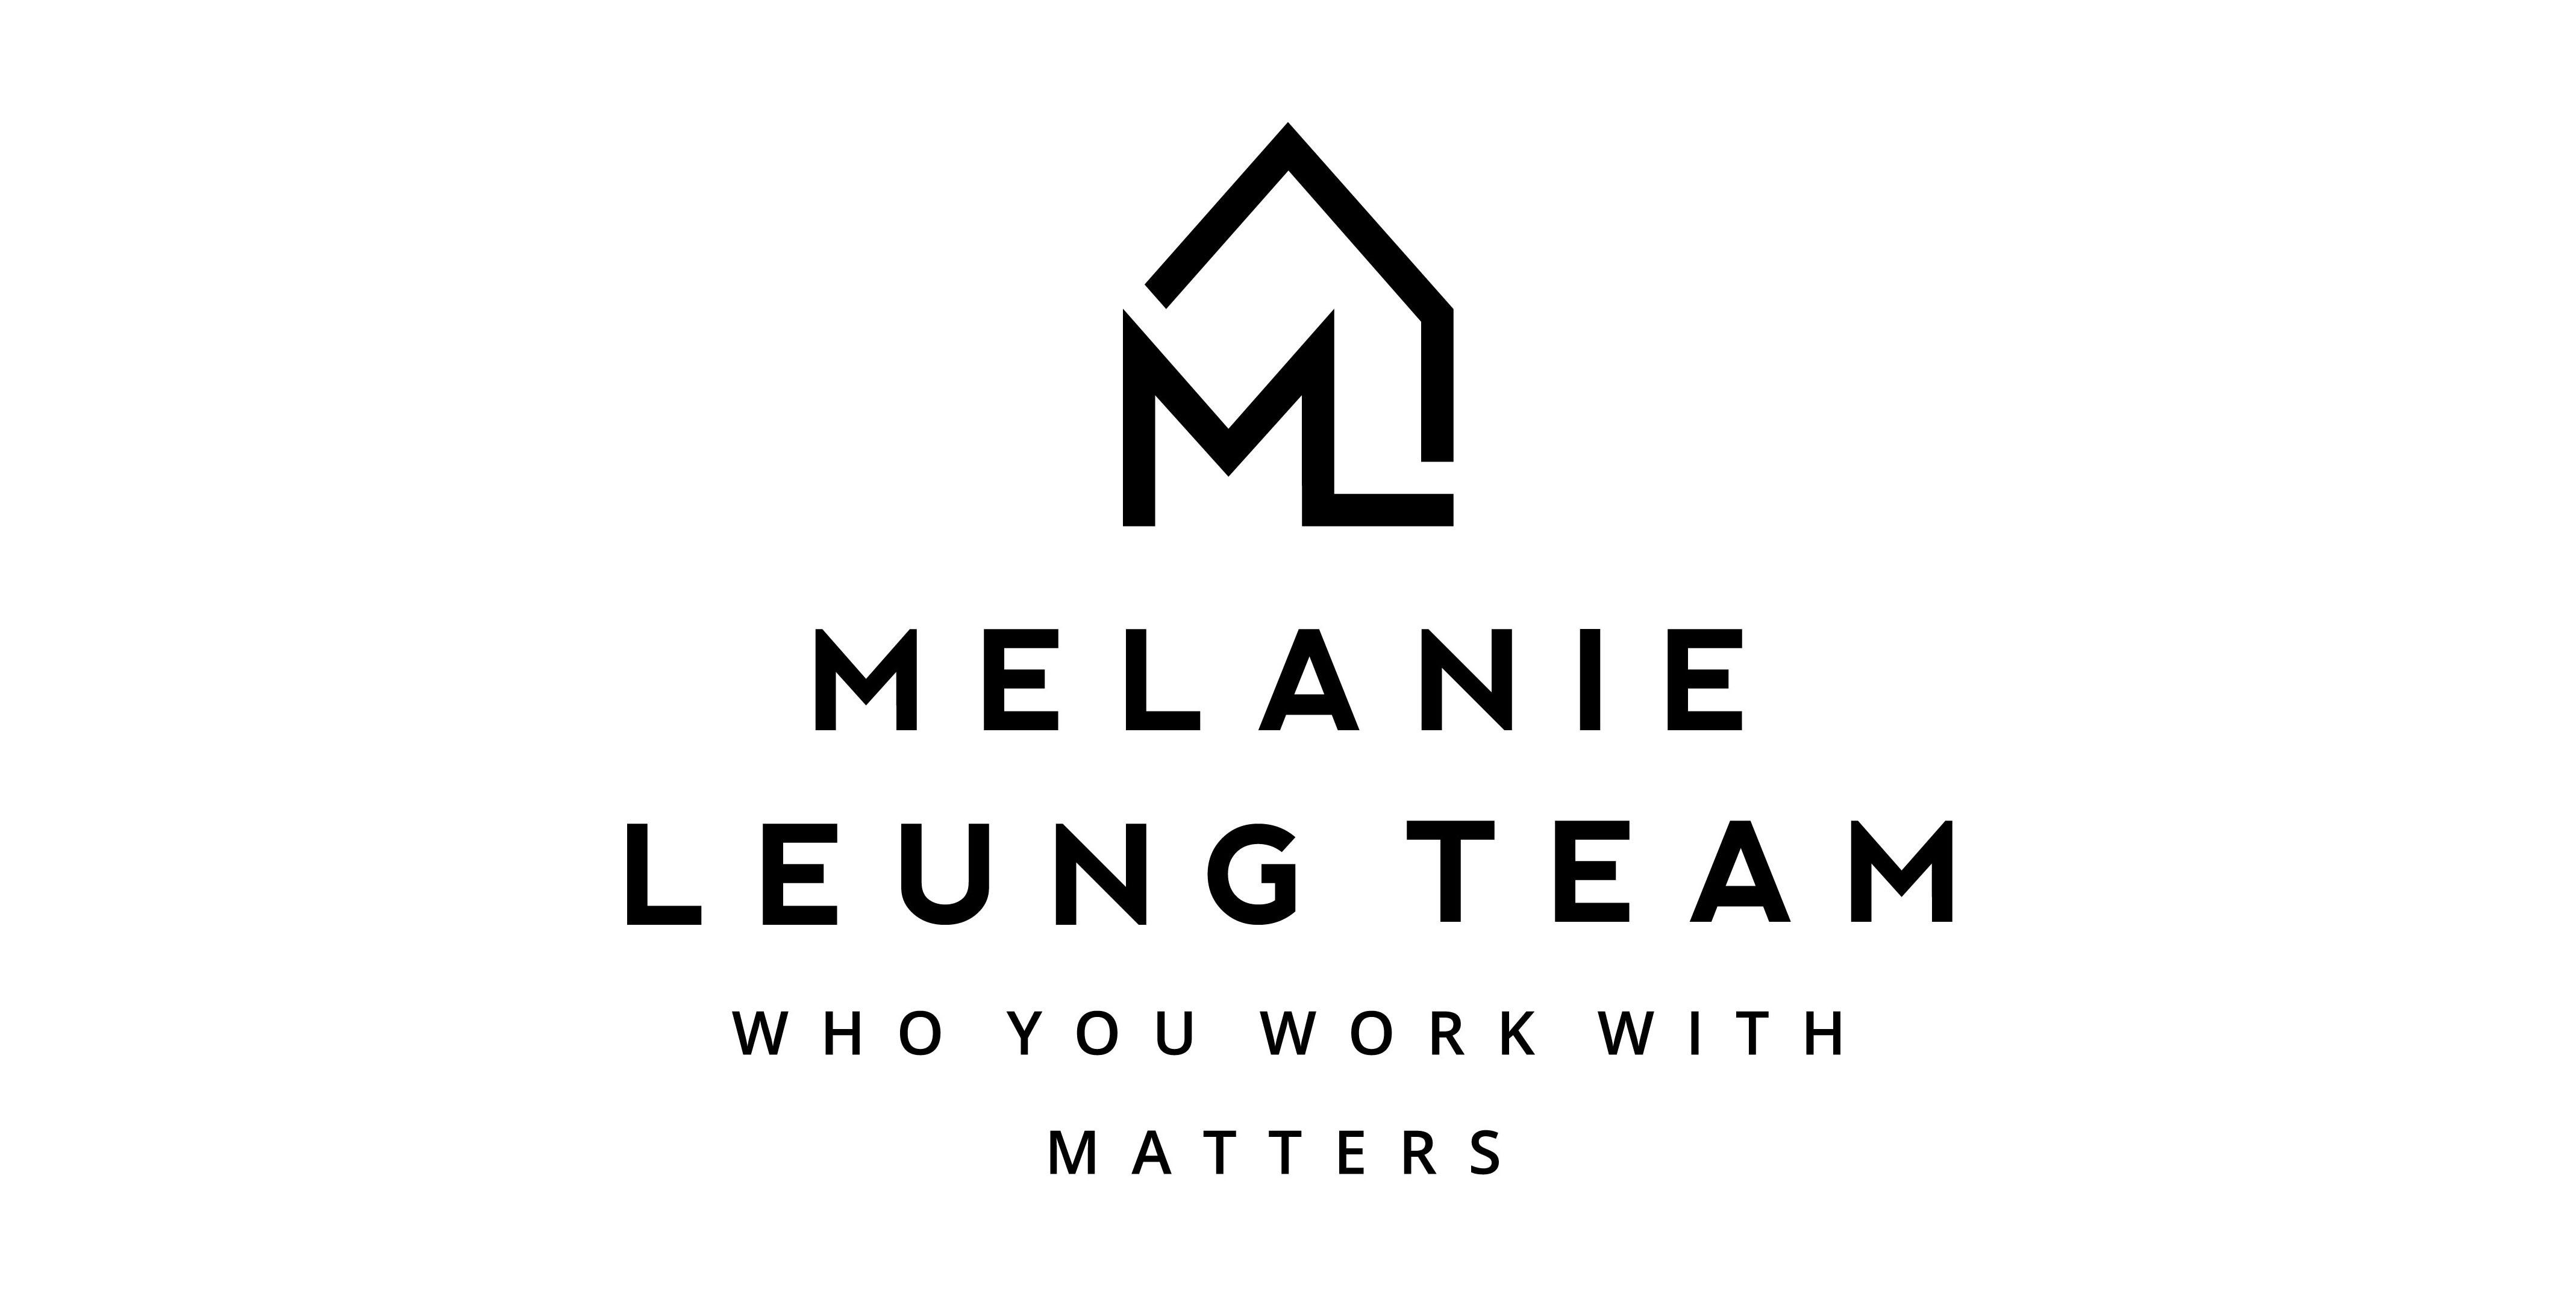 Melanie Leung Team & KeyOpp Property Management & Investments logo